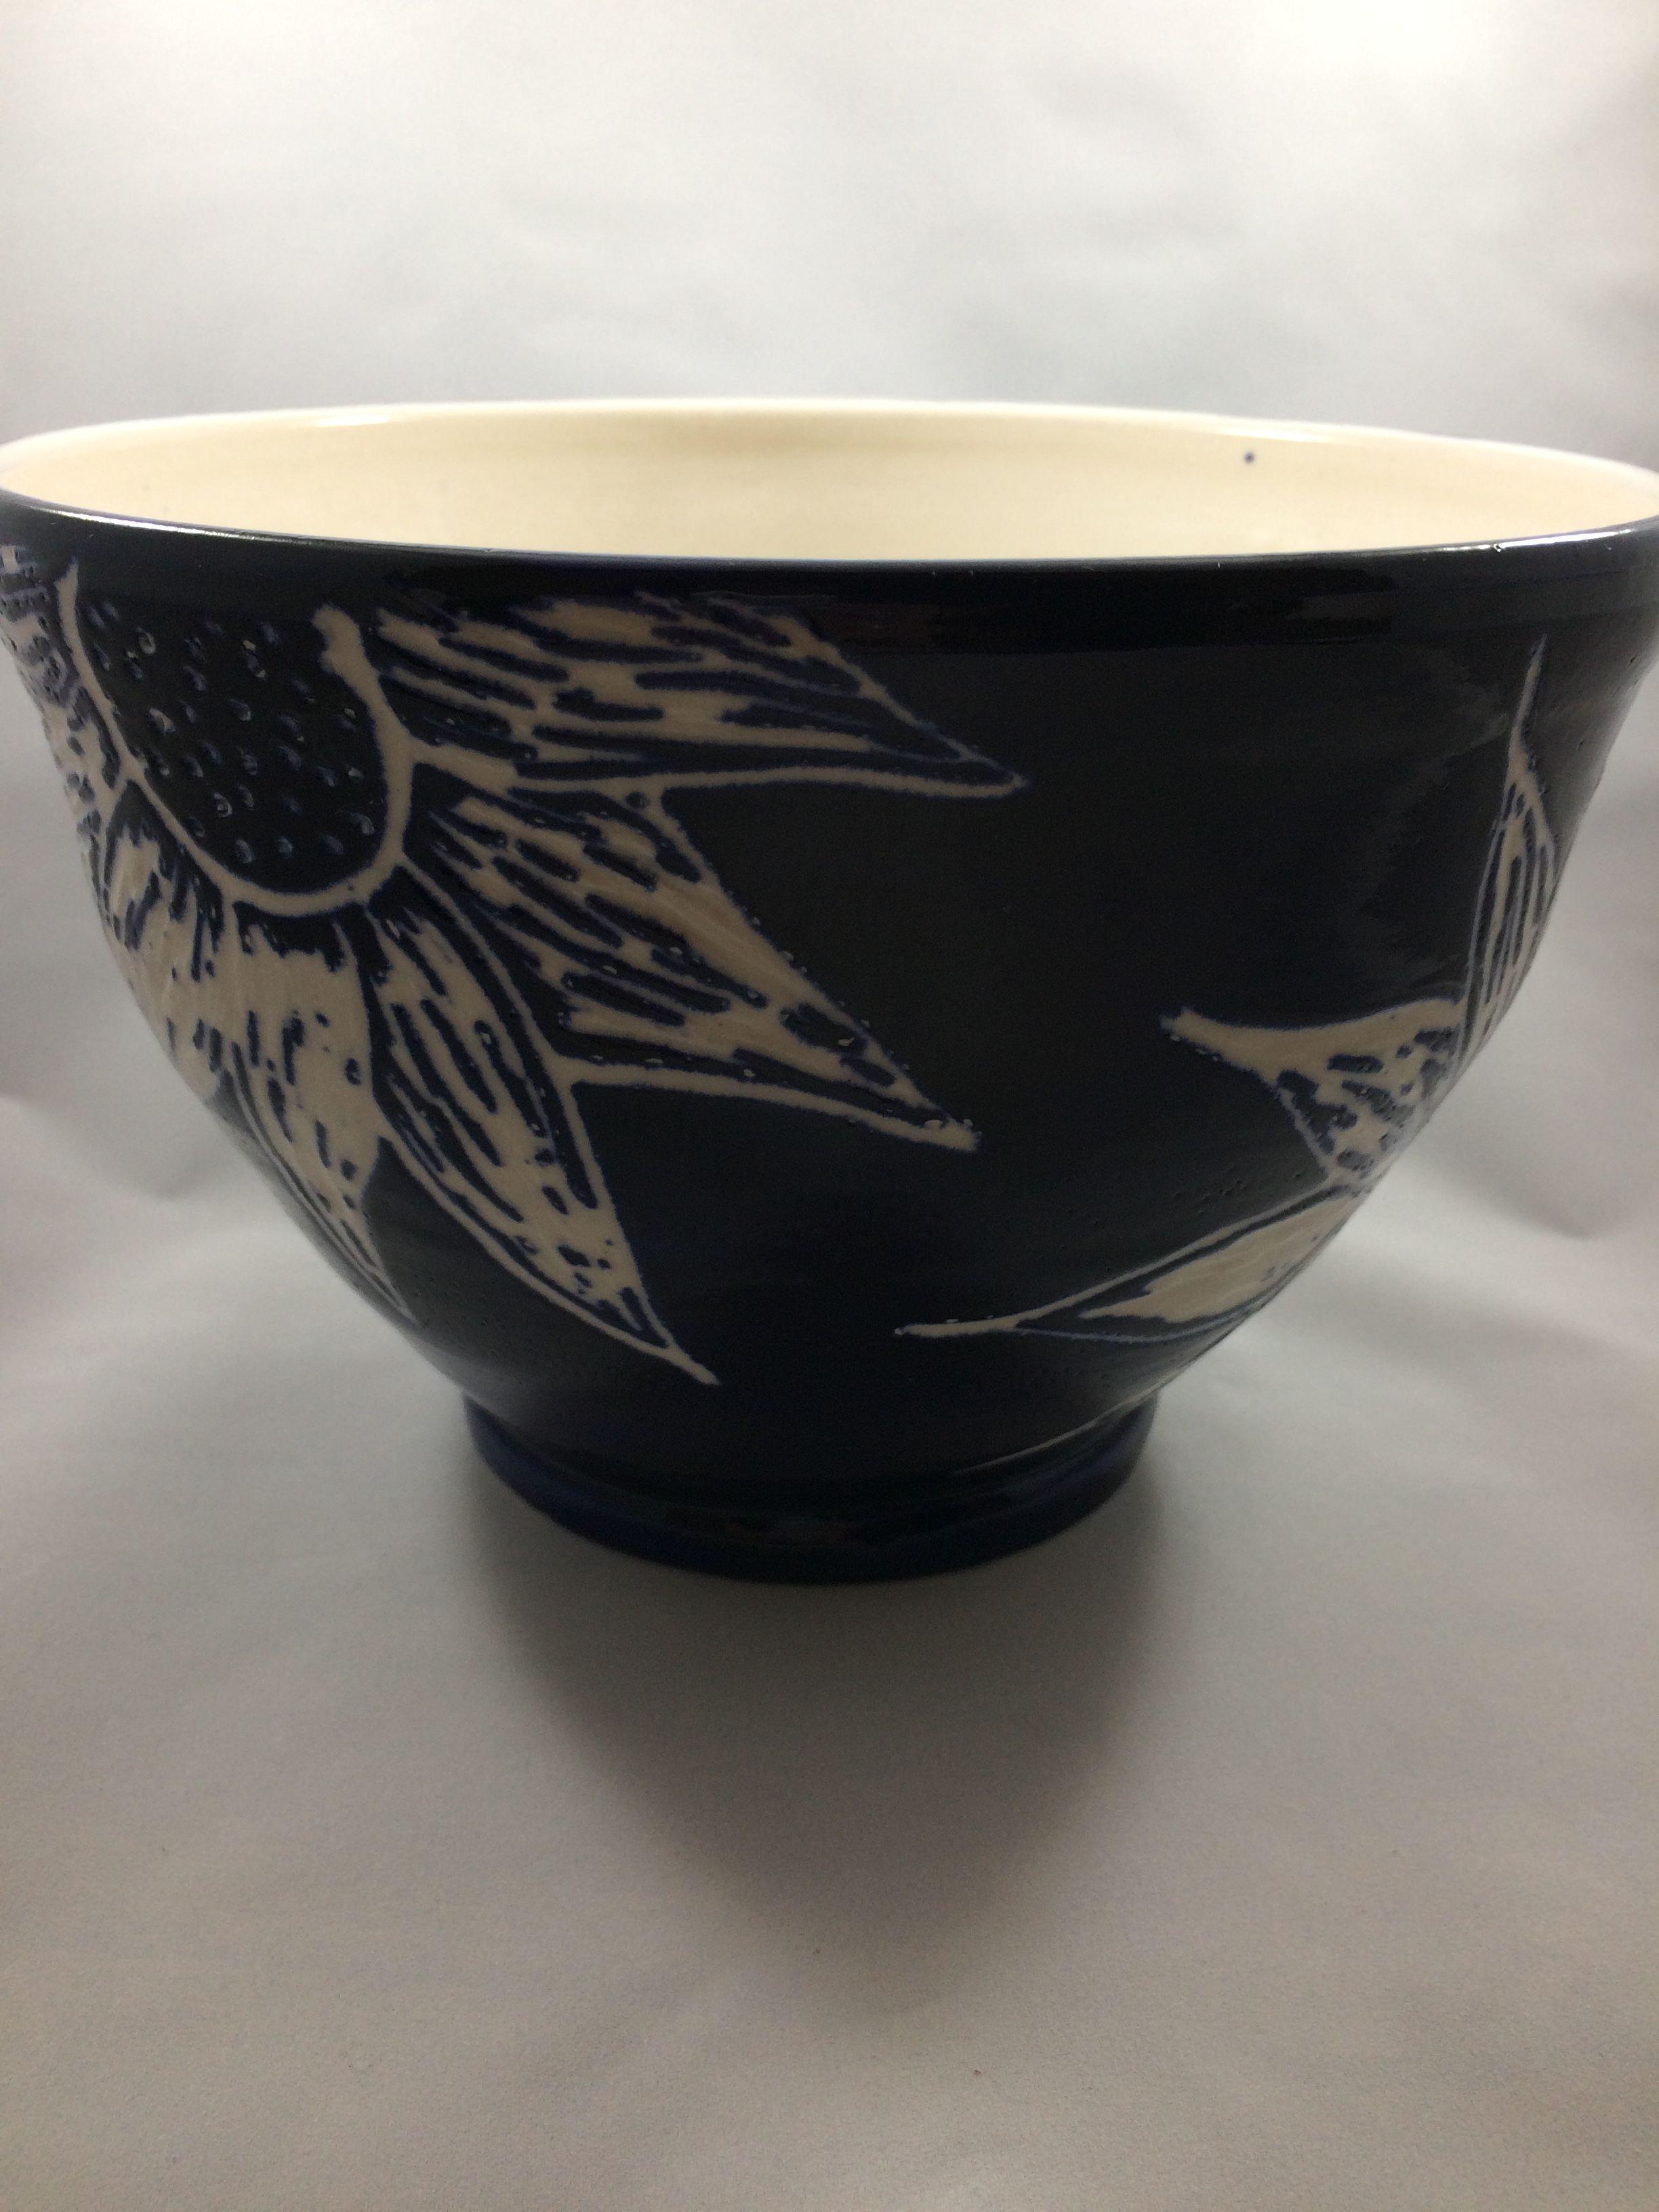 Large porcelain bowl with sgraffito